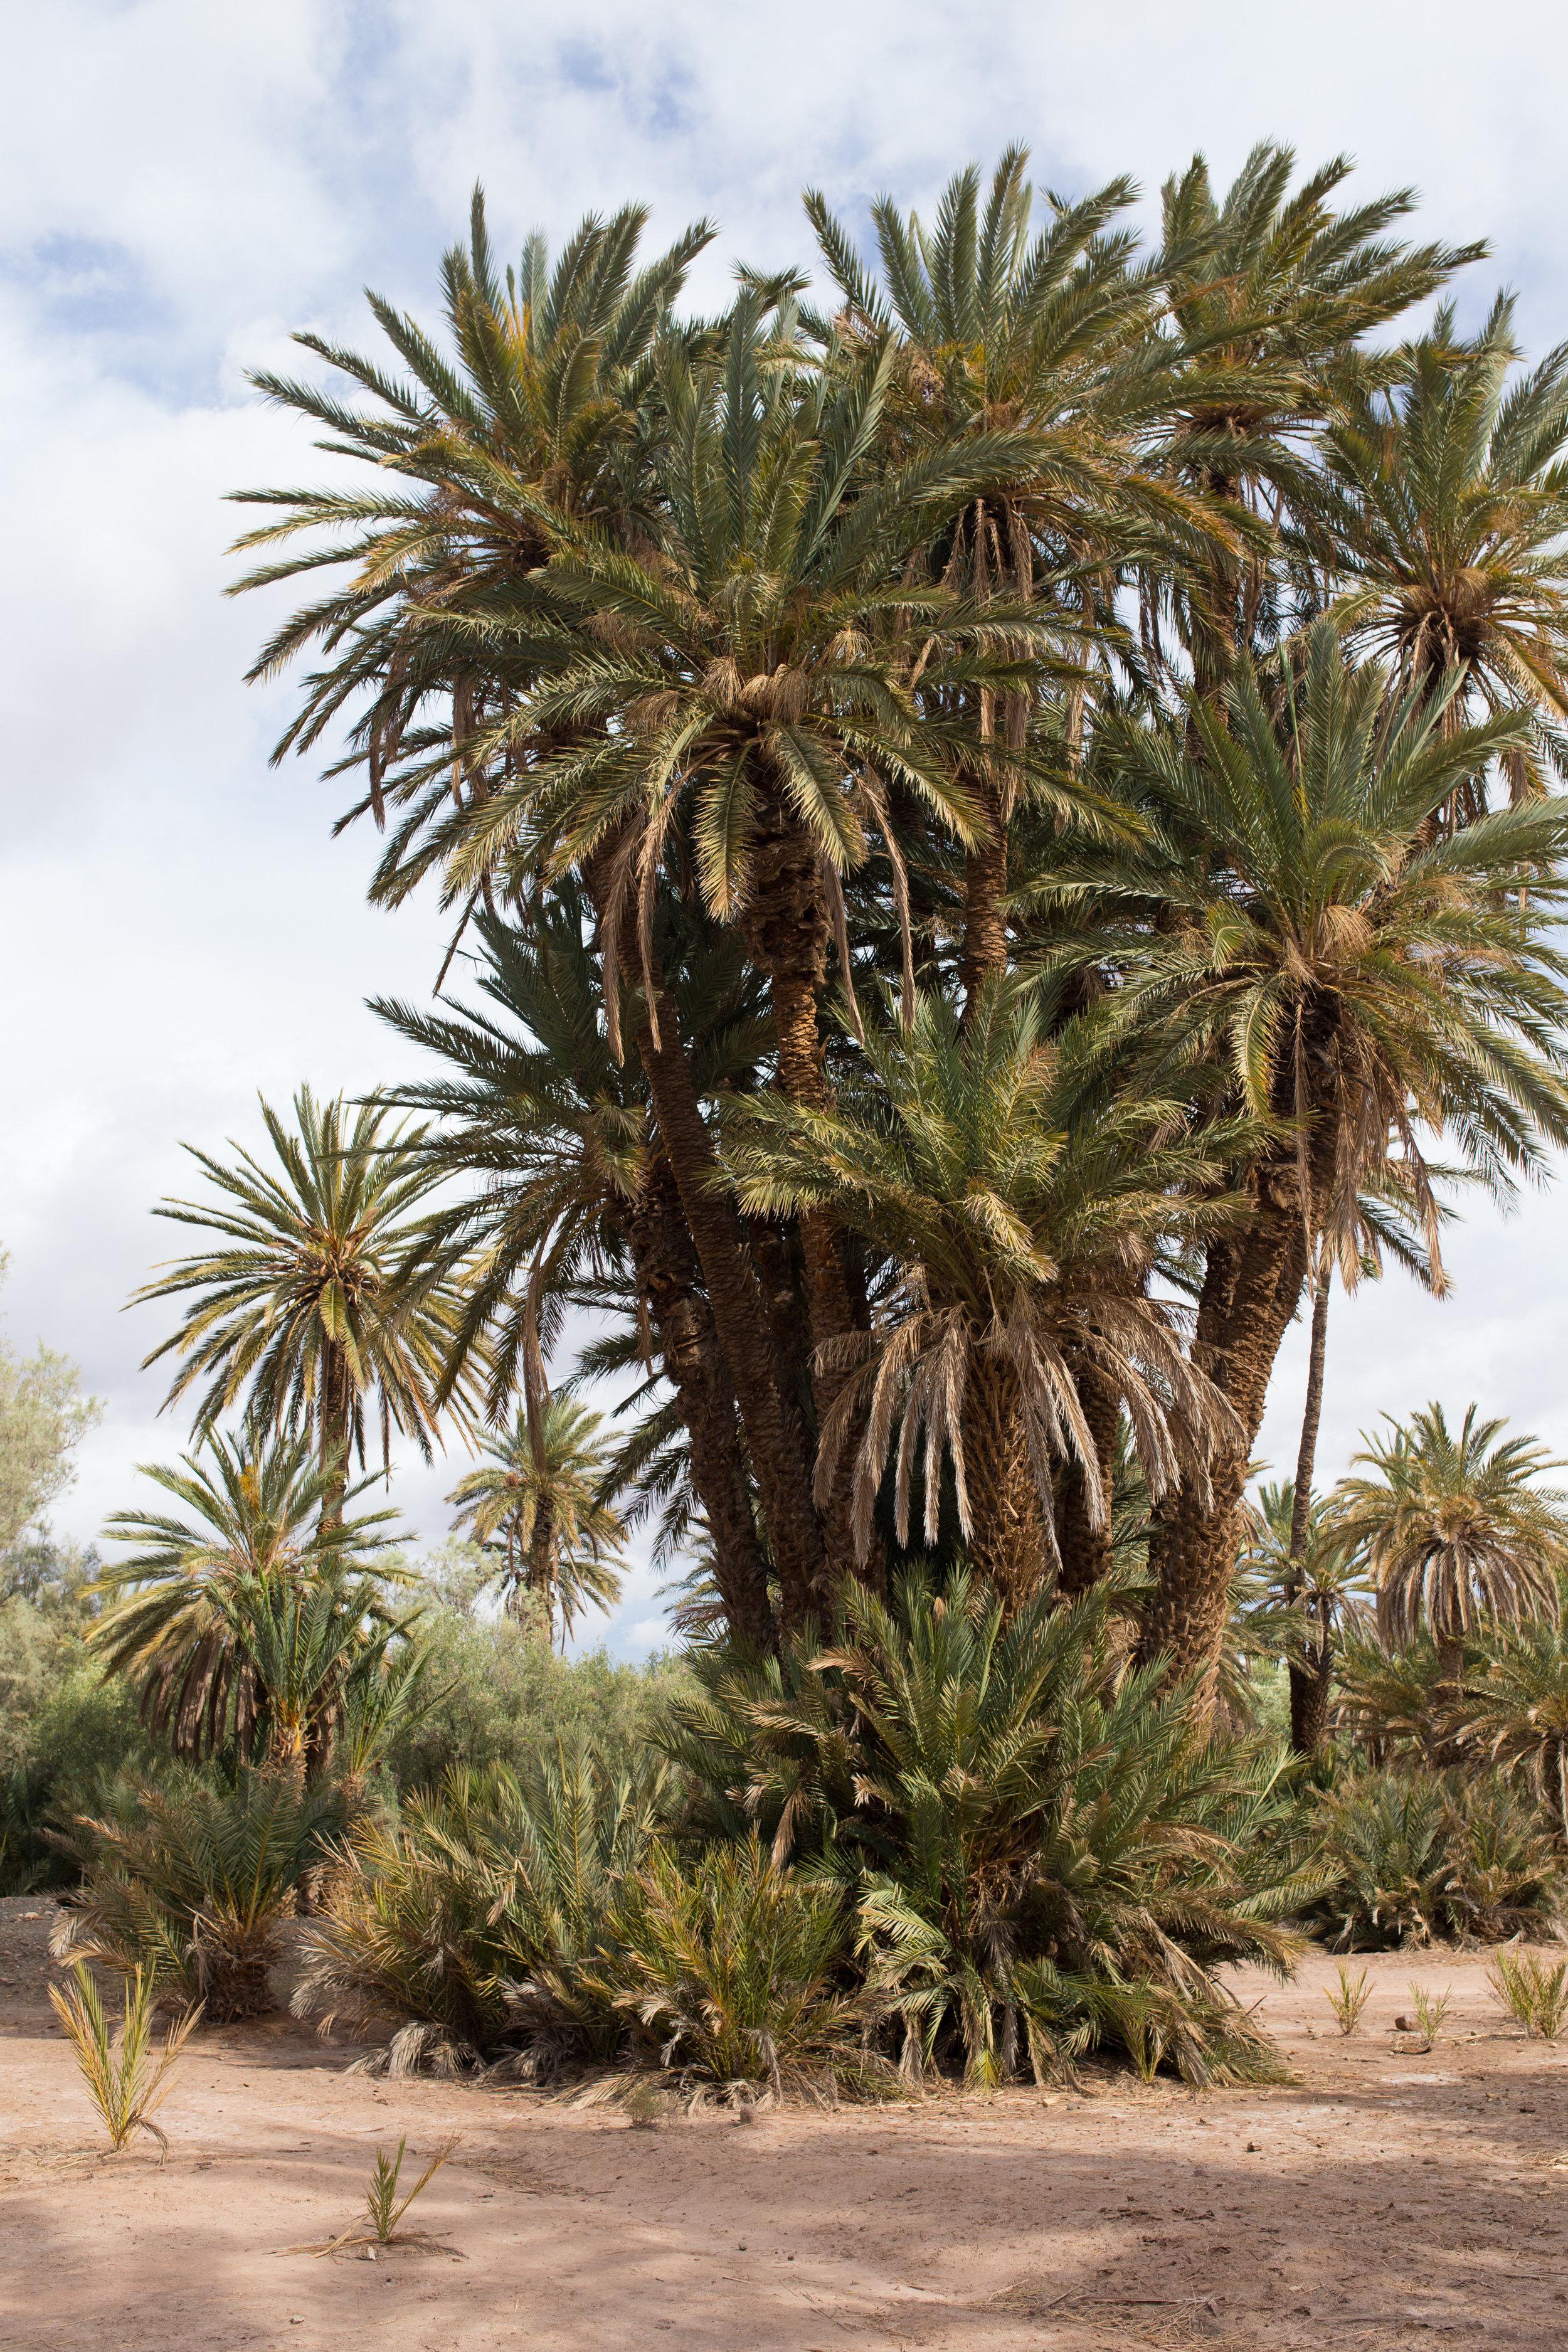 morocco-morocco travel-visit morocco-travel-travel photography-travel photographer-alina mendoza-alina mendoza photography-107.jpg